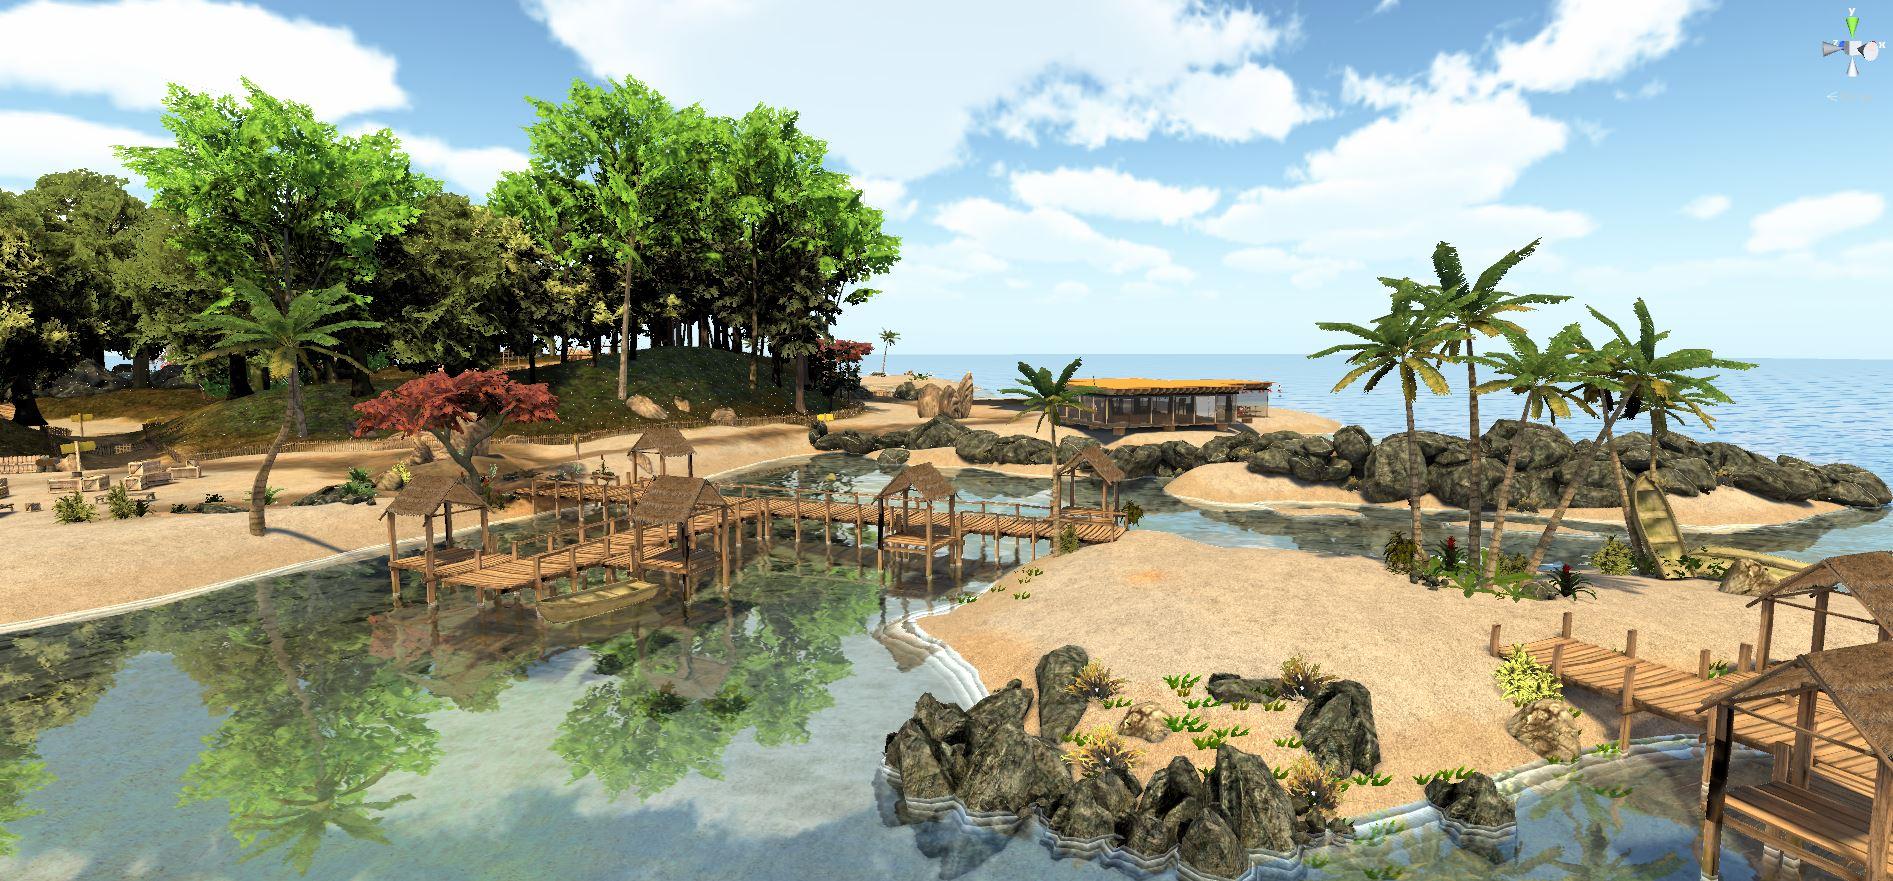 GNATs Island